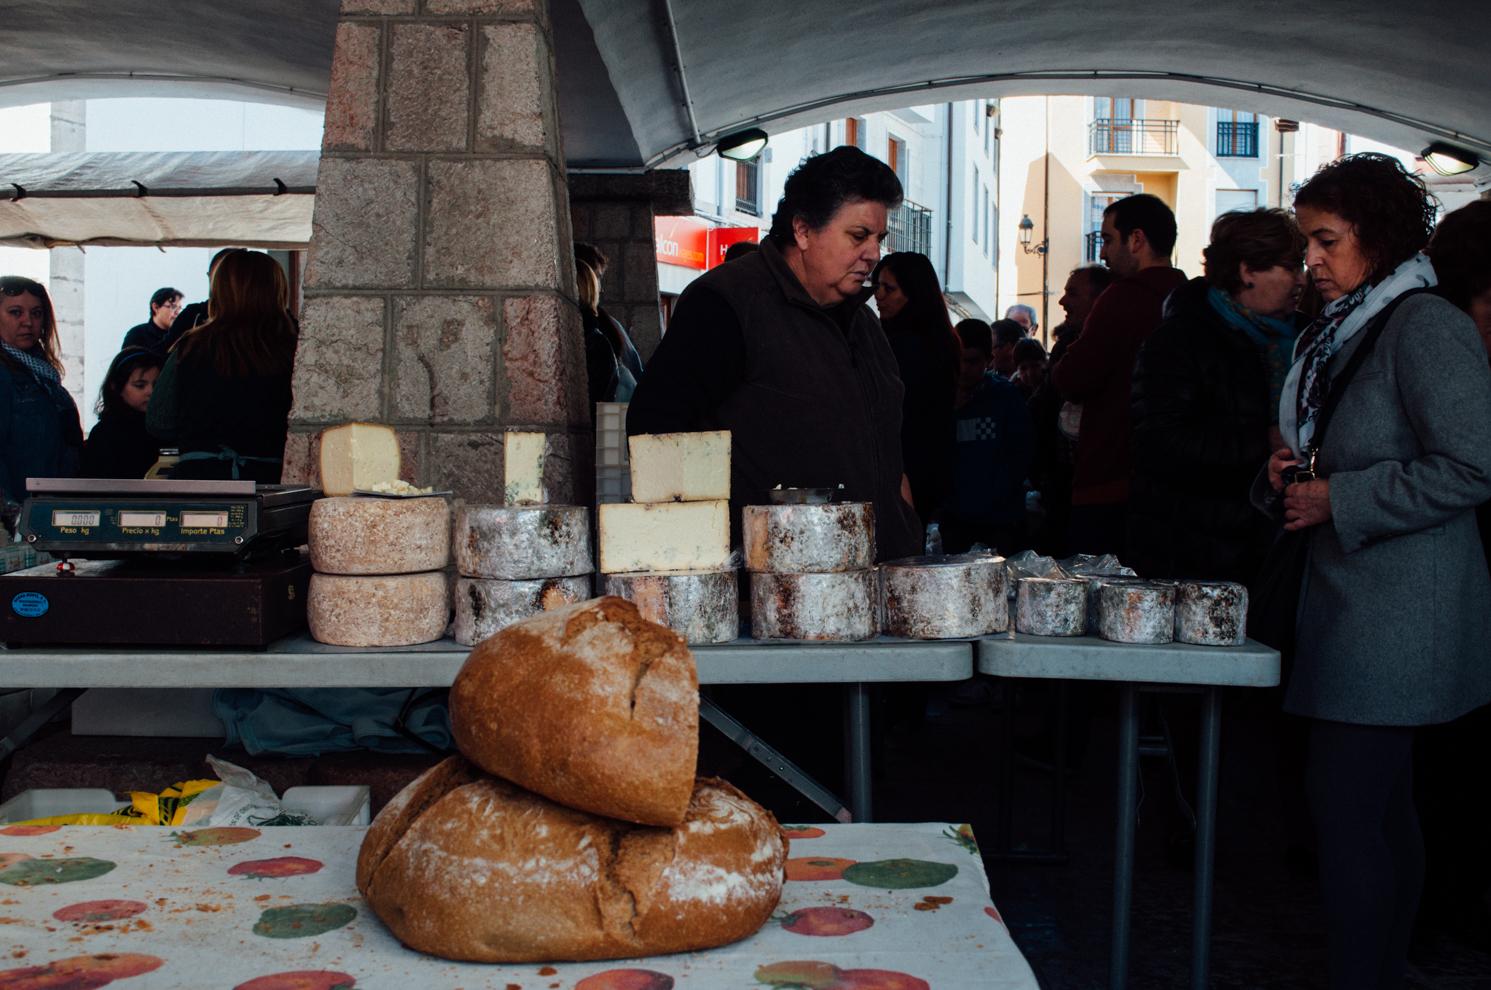 Mercado_de_Cangas_de_Onis_by_MonicaRGoya-17.jpg